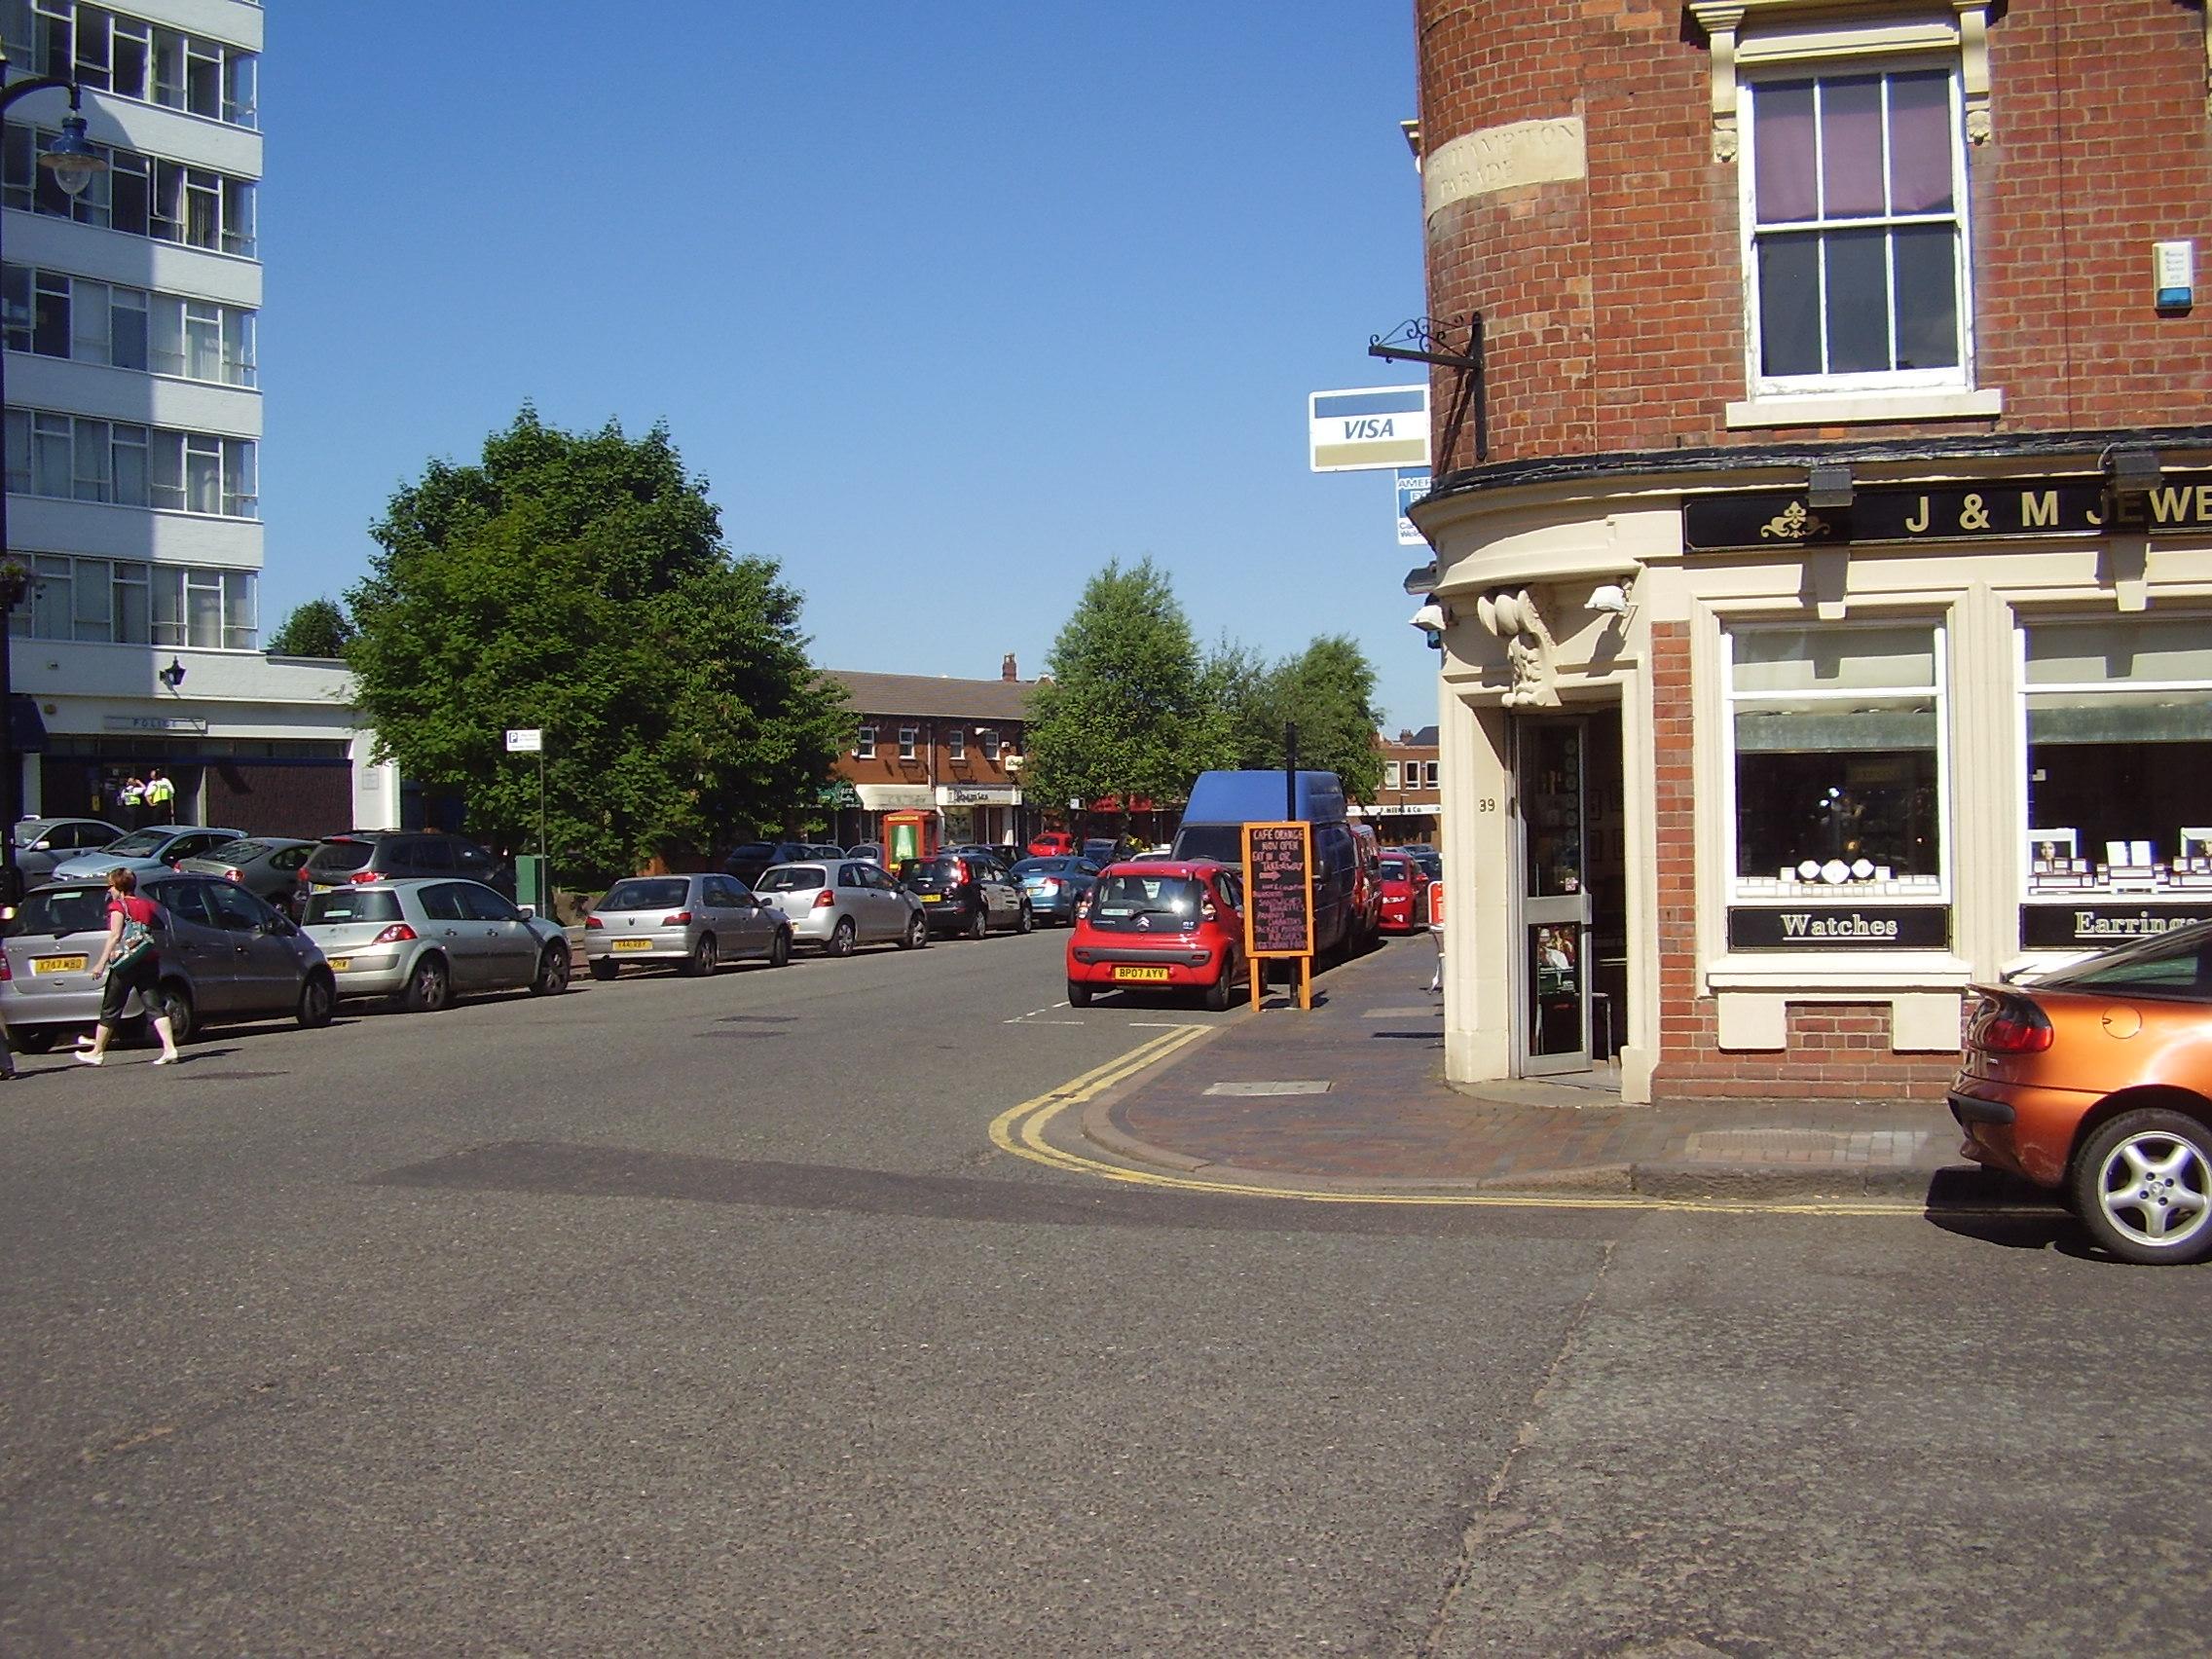 2008 Street view of the Jewellery Quarter in Birmingham 2